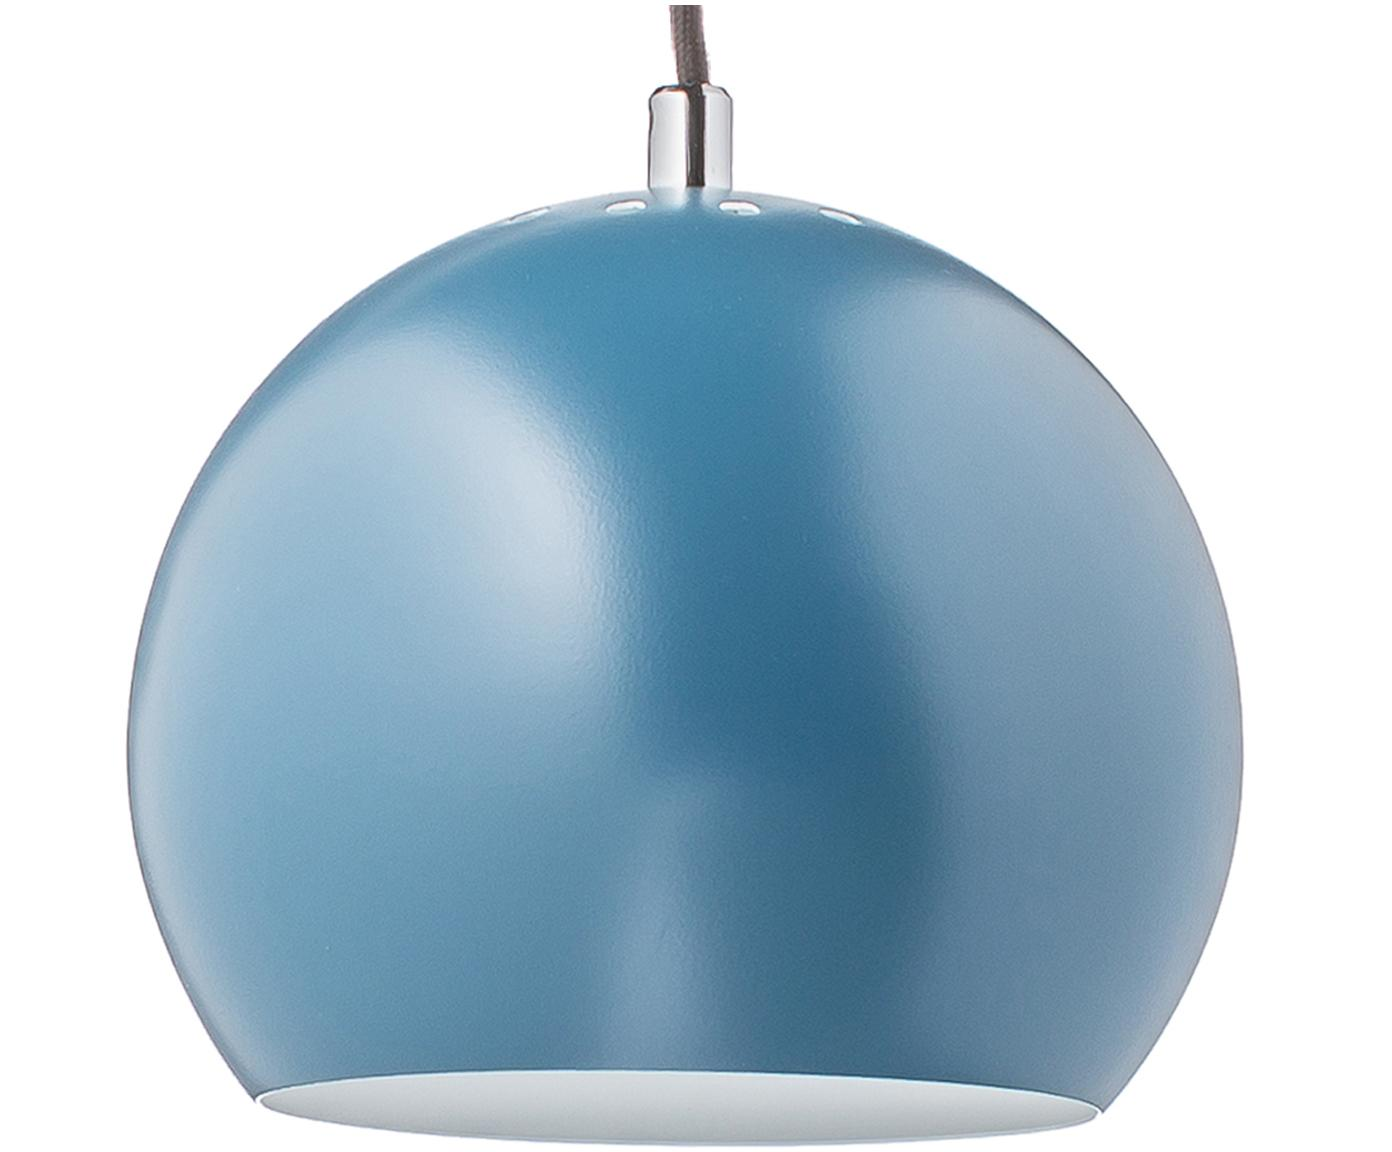 Lampada a sospensione a sfera Ball, Metallo verniciato a polvere, verde benzina, Ø 18 x Alt. 16 cm